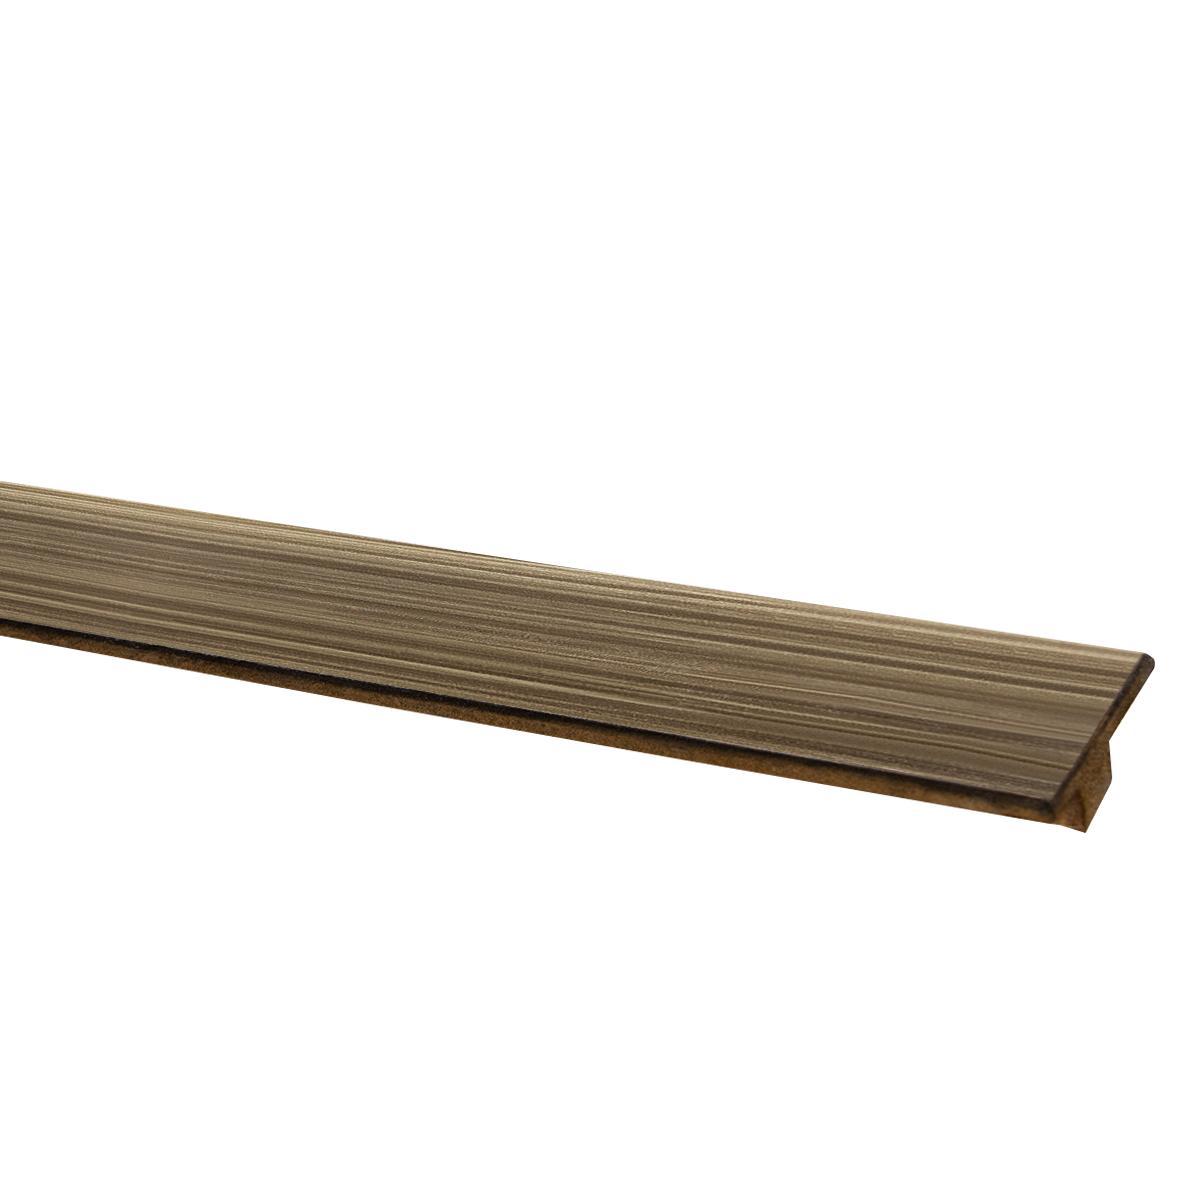 Perfil De Terminación Urban Roble Walnut Mate - 5X200 cm